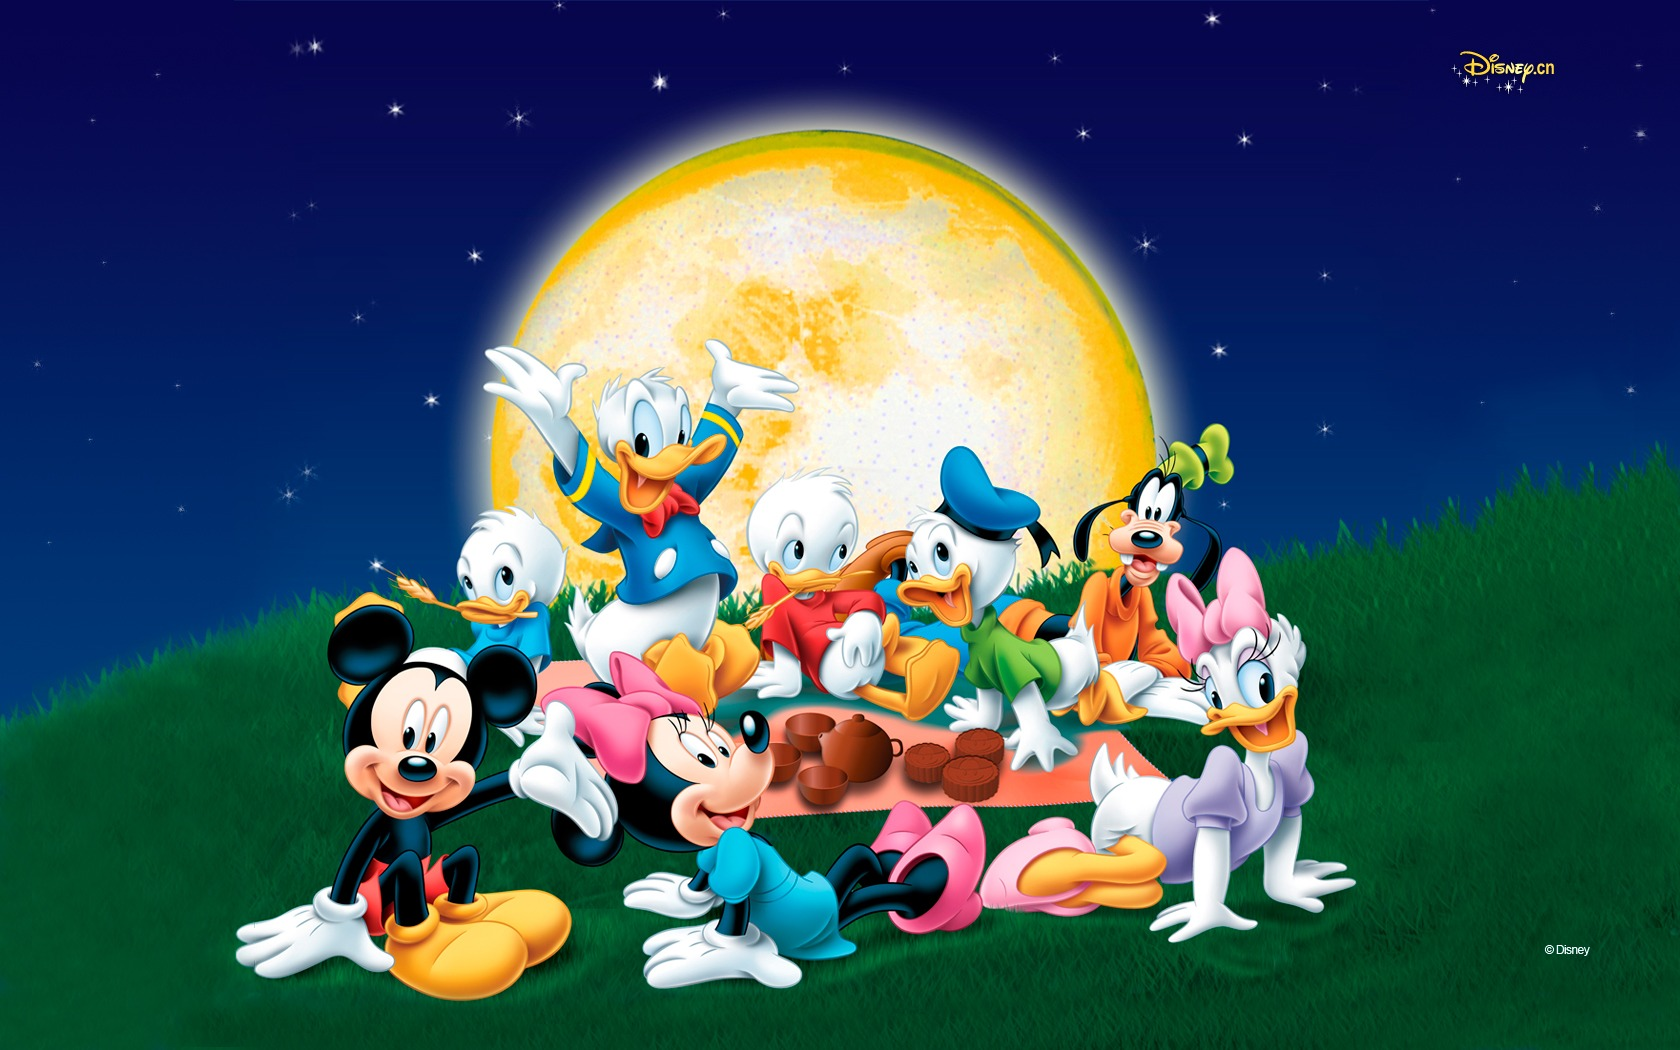 Wonderful Wallpaper Halloween Mickey Mouse - mickey_mouse_halloween_wallpaper_007  Photograph_27893.jpg